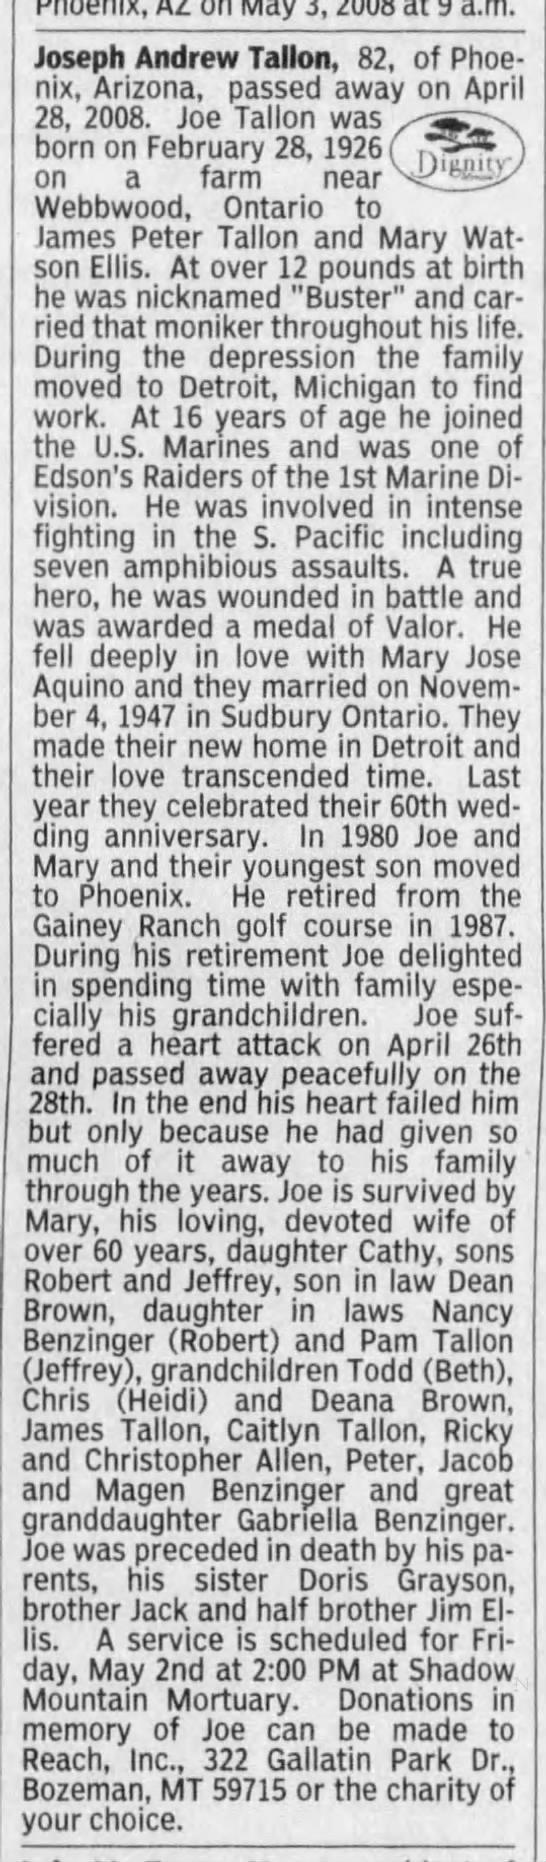 joseph peter tallon born in webbwood Ontario 1926 relation? - pnoenix, az on May 3, 2008 at 9 a.m. Joseph...